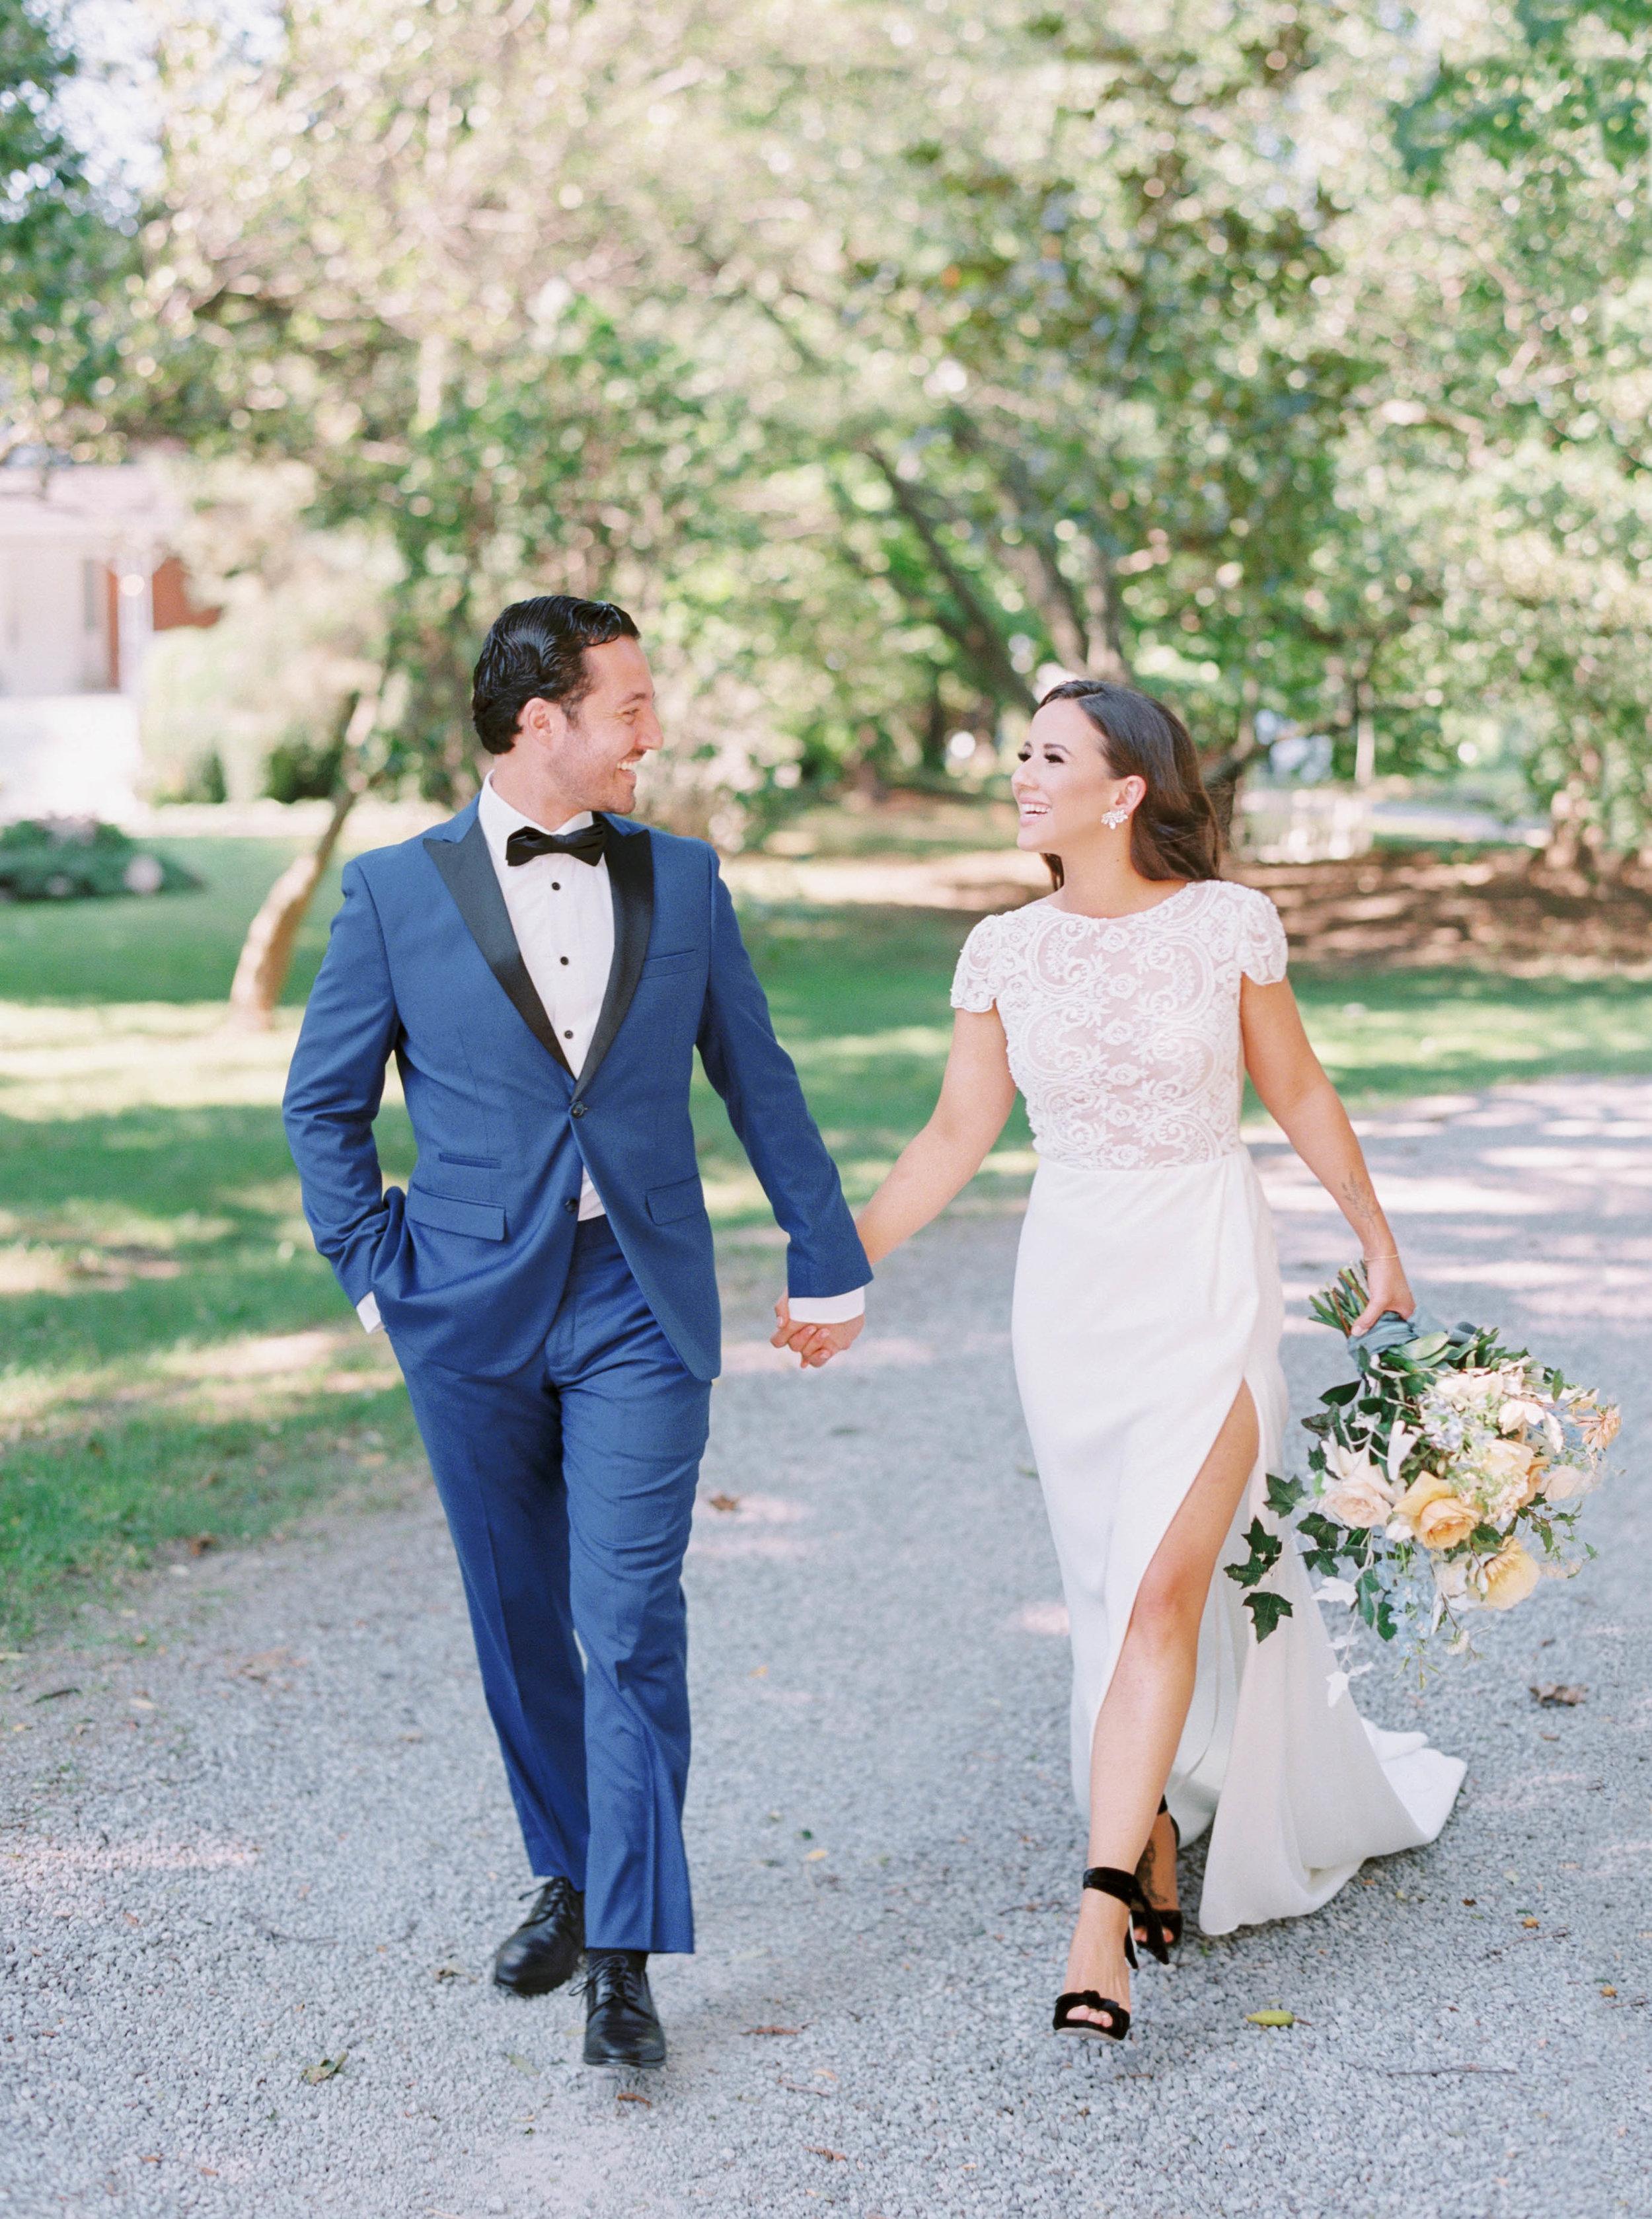 kurtz-gracewood-wedding-soft-airy-photographer-white-book-danielle-carmen-5 cool.jpg